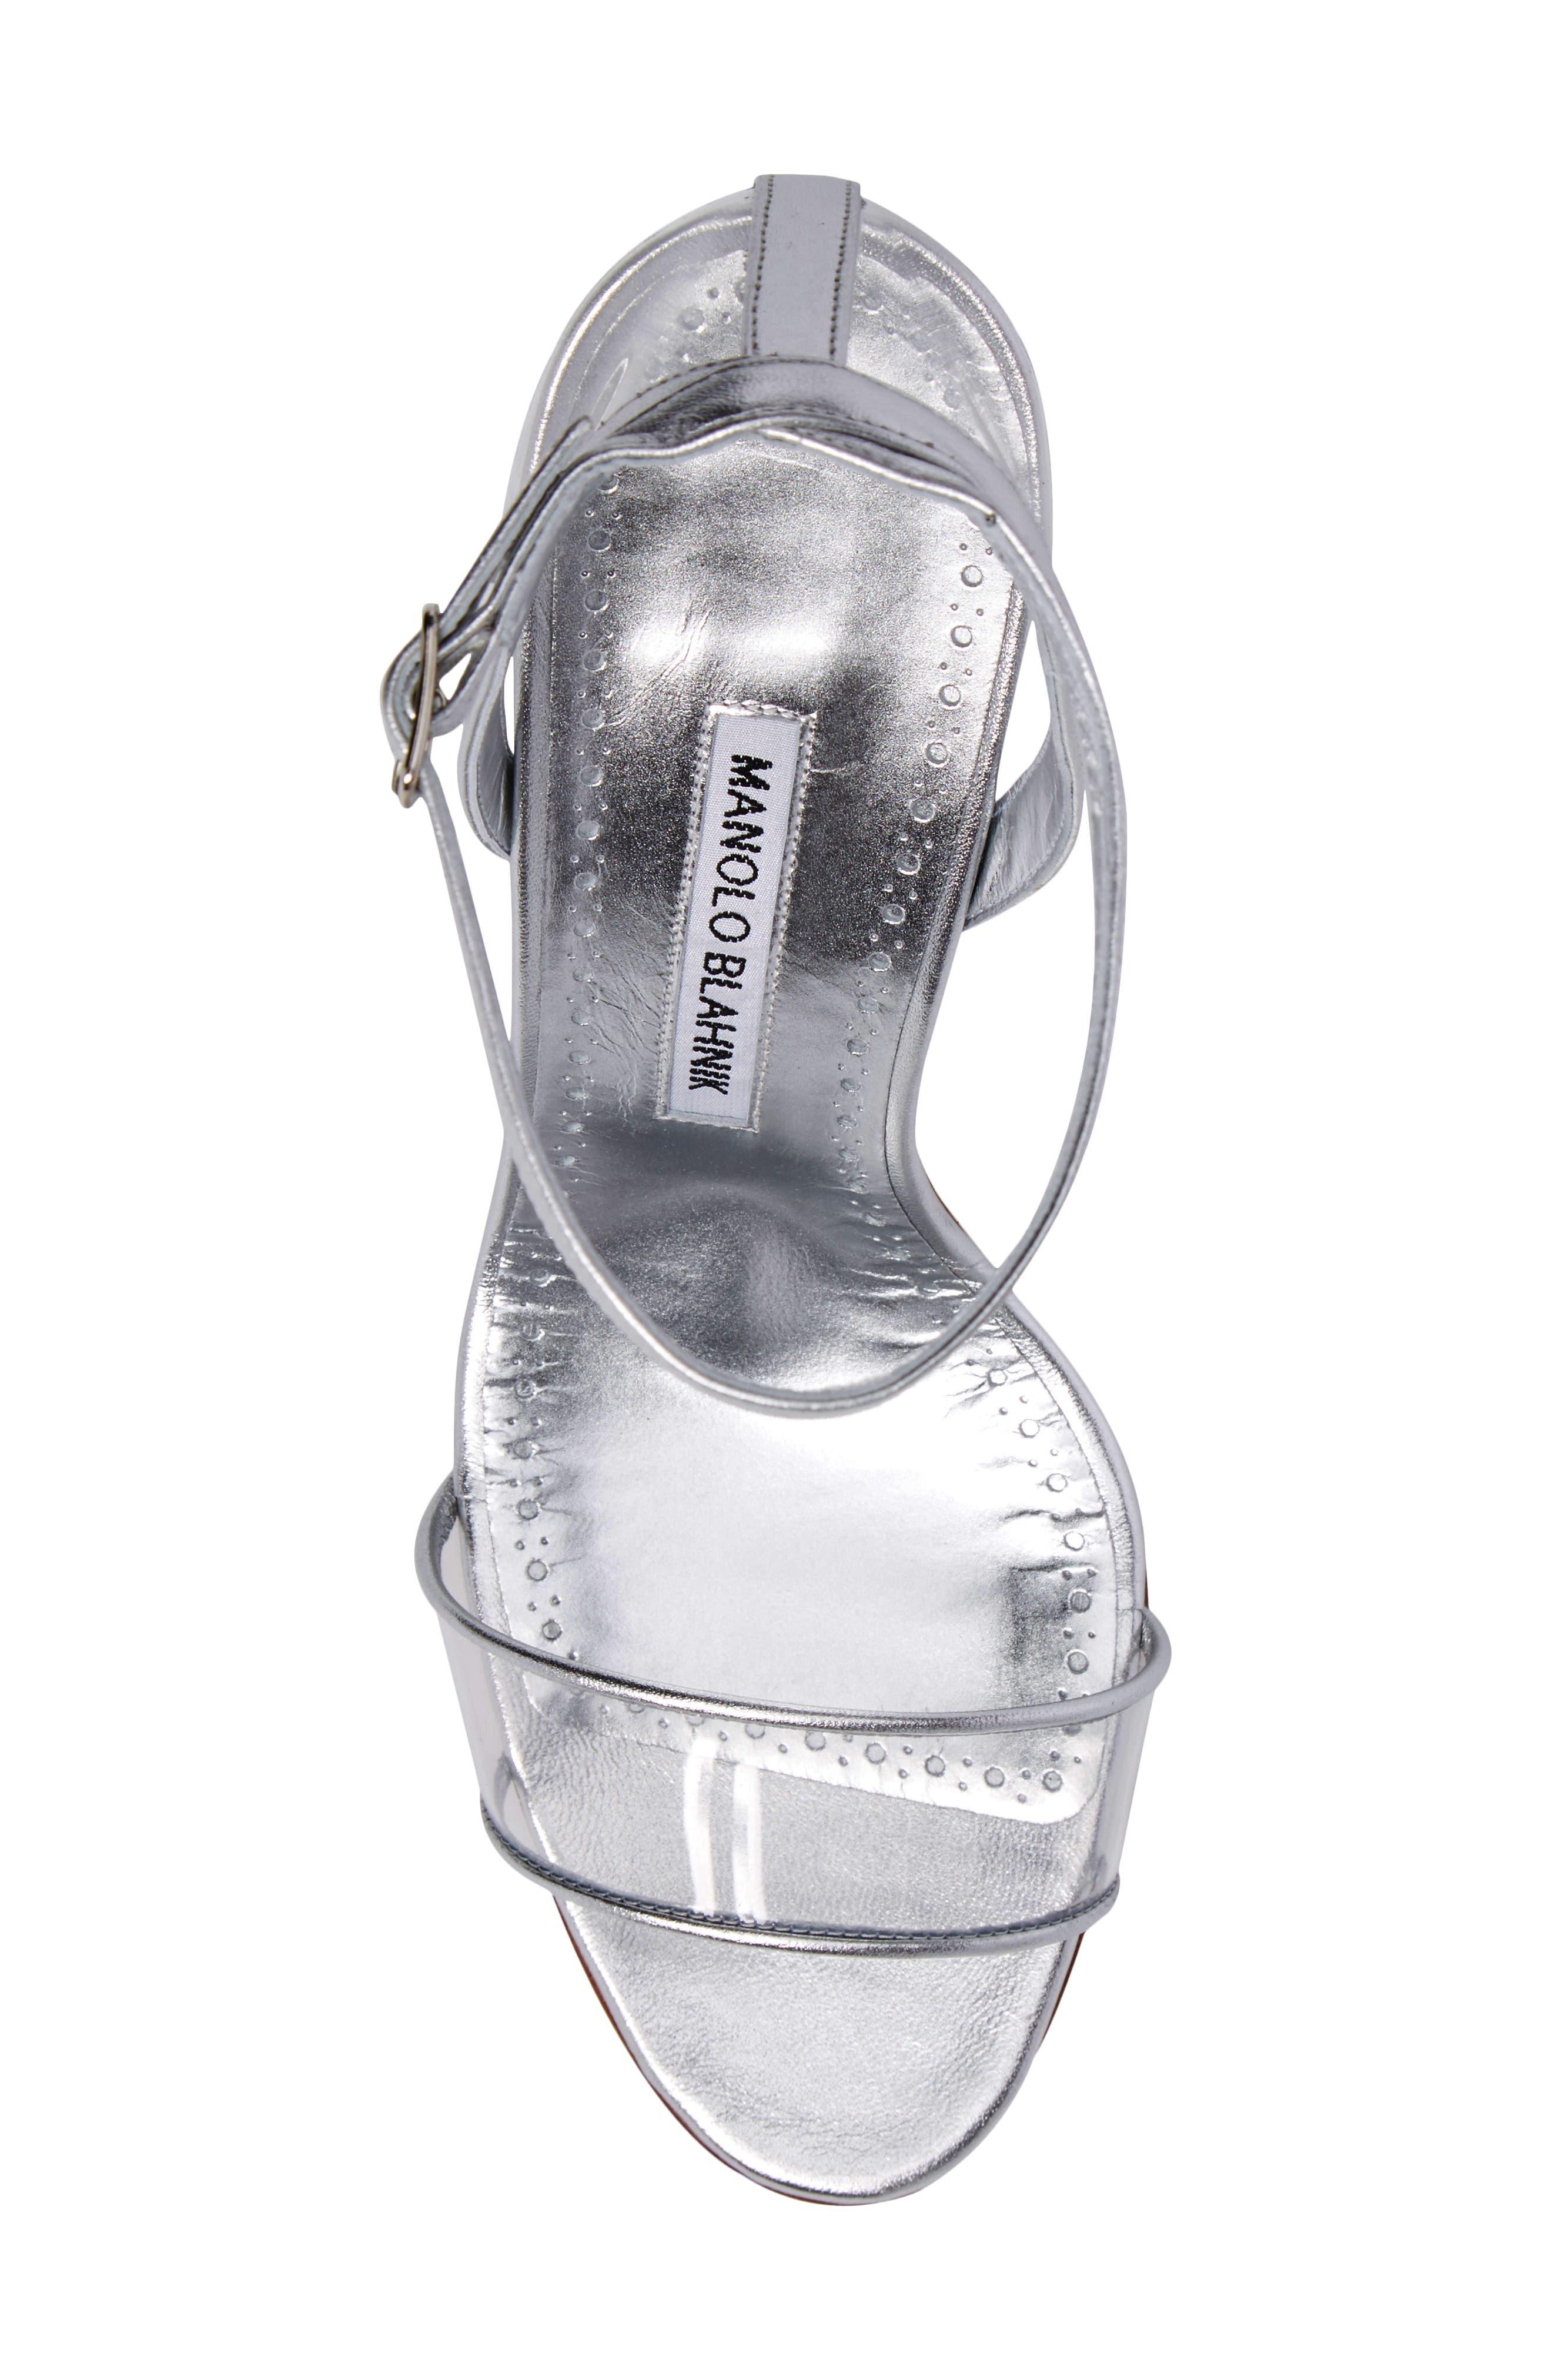 Dandolo See-Through Strappy Sandal,                             Alternate thumbnail 5, color,                             040